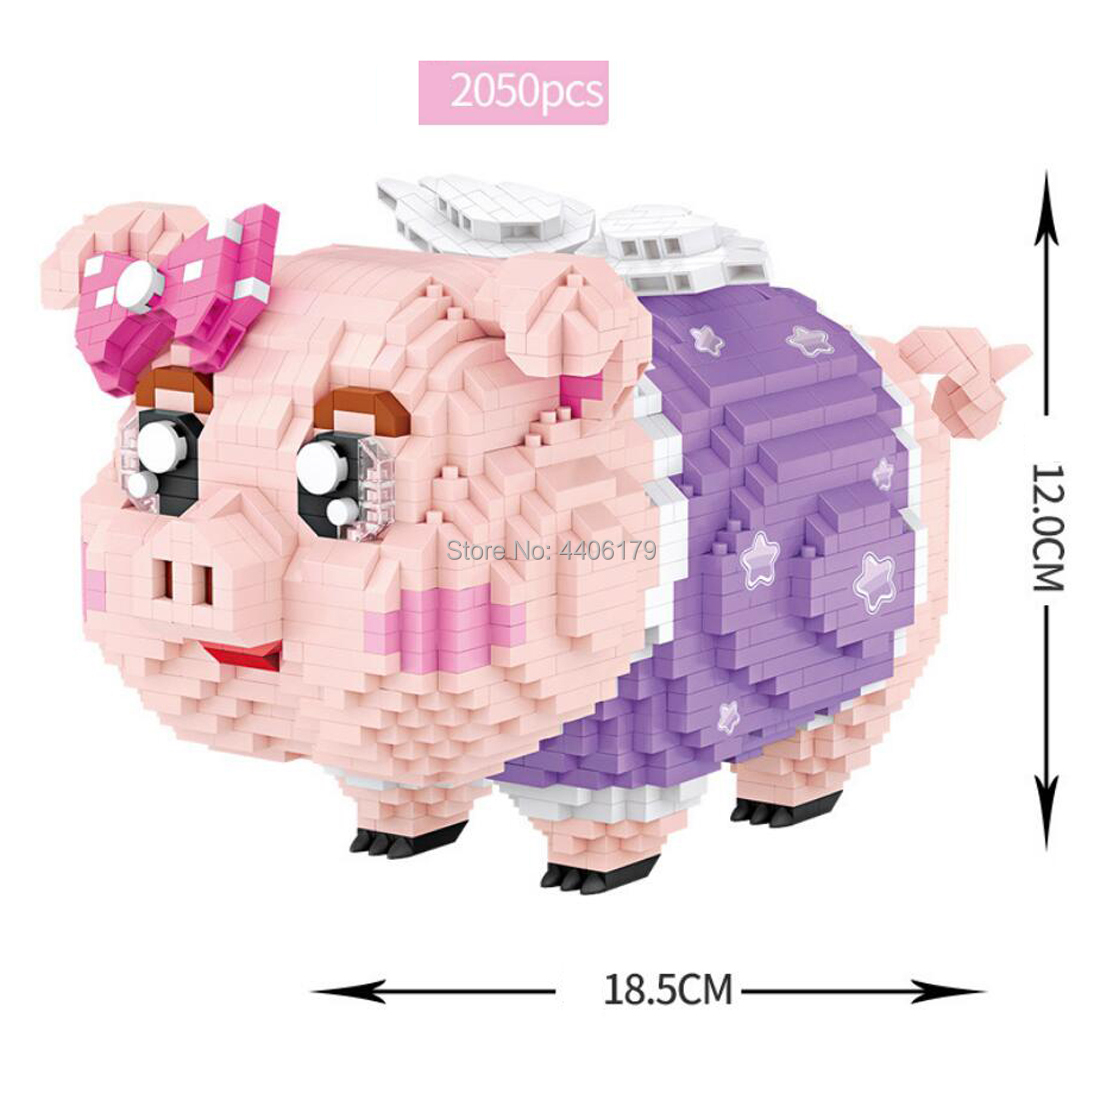 hot LegoINGlys creators Lovely animals cartoon piggy bank angel pig Pink mini micro diamond building block model brick toys gift